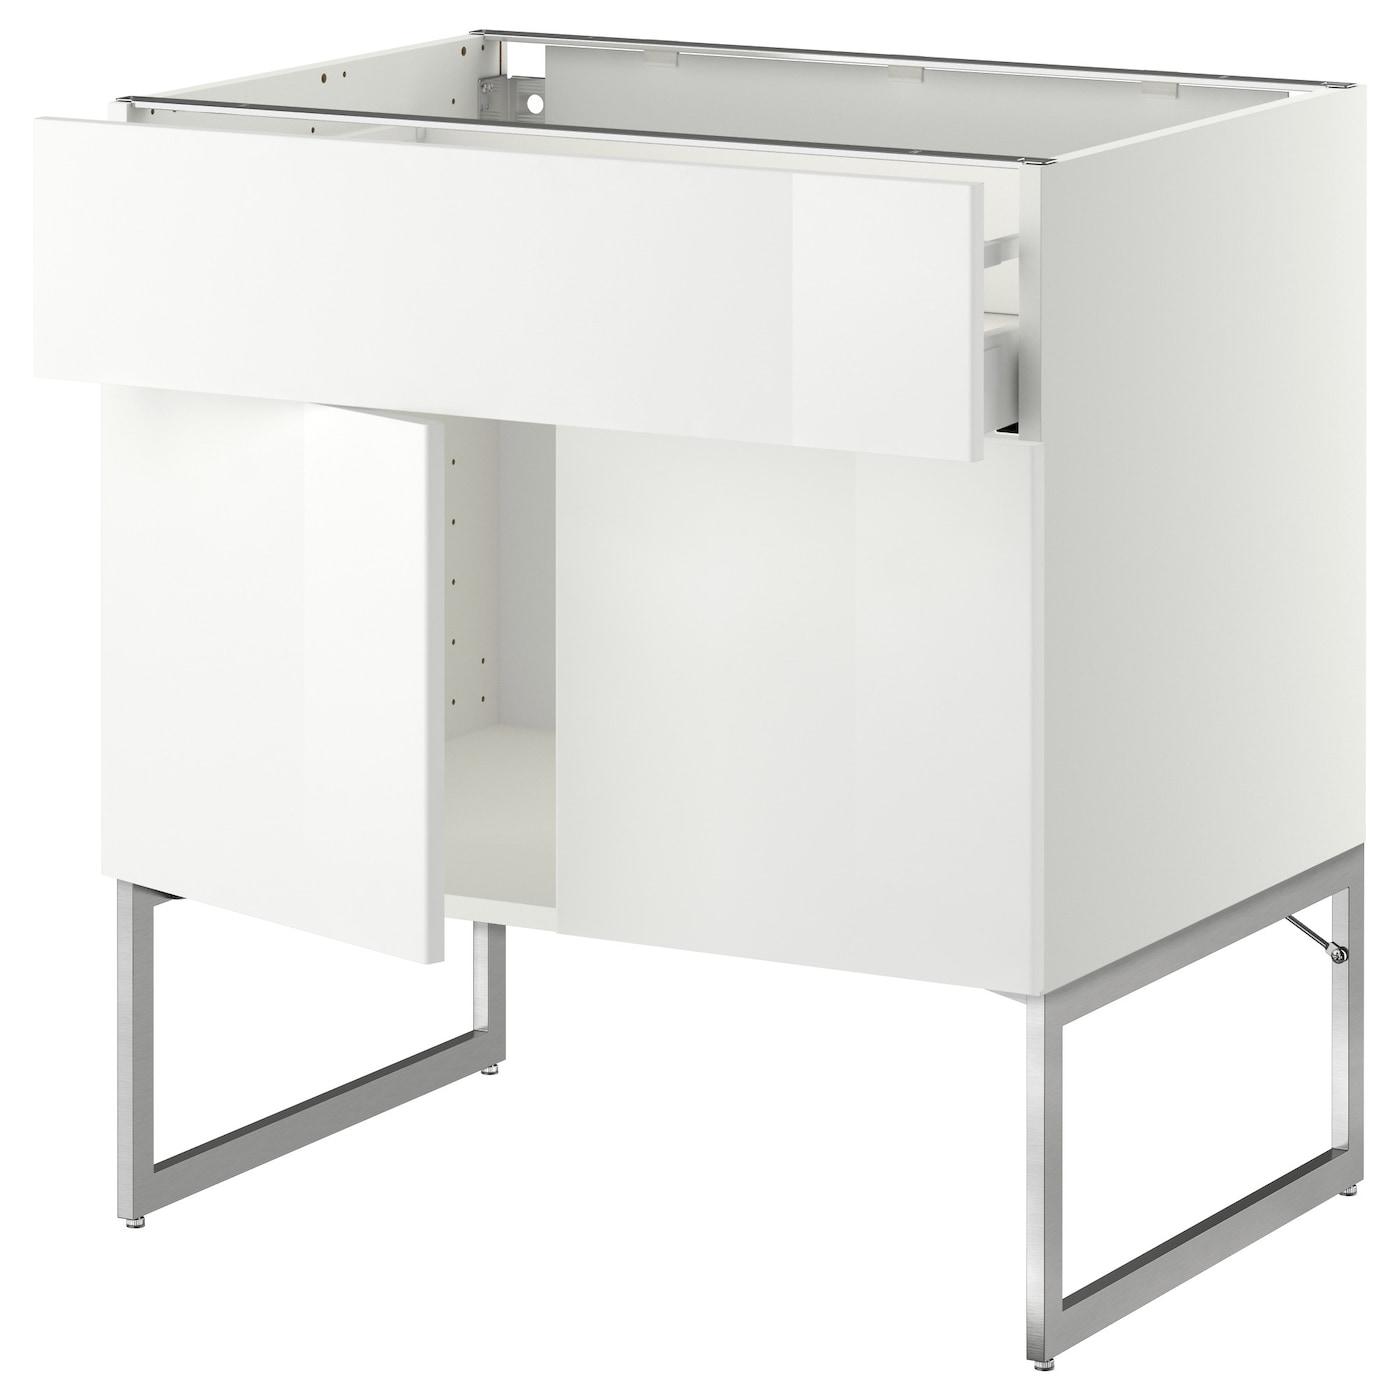 metod maximera base cabinet shelves drawer 2 doors white ringhult white 80x60x60 cm ikea. Black Bedroom Furniture Sets. Home Design Ideas